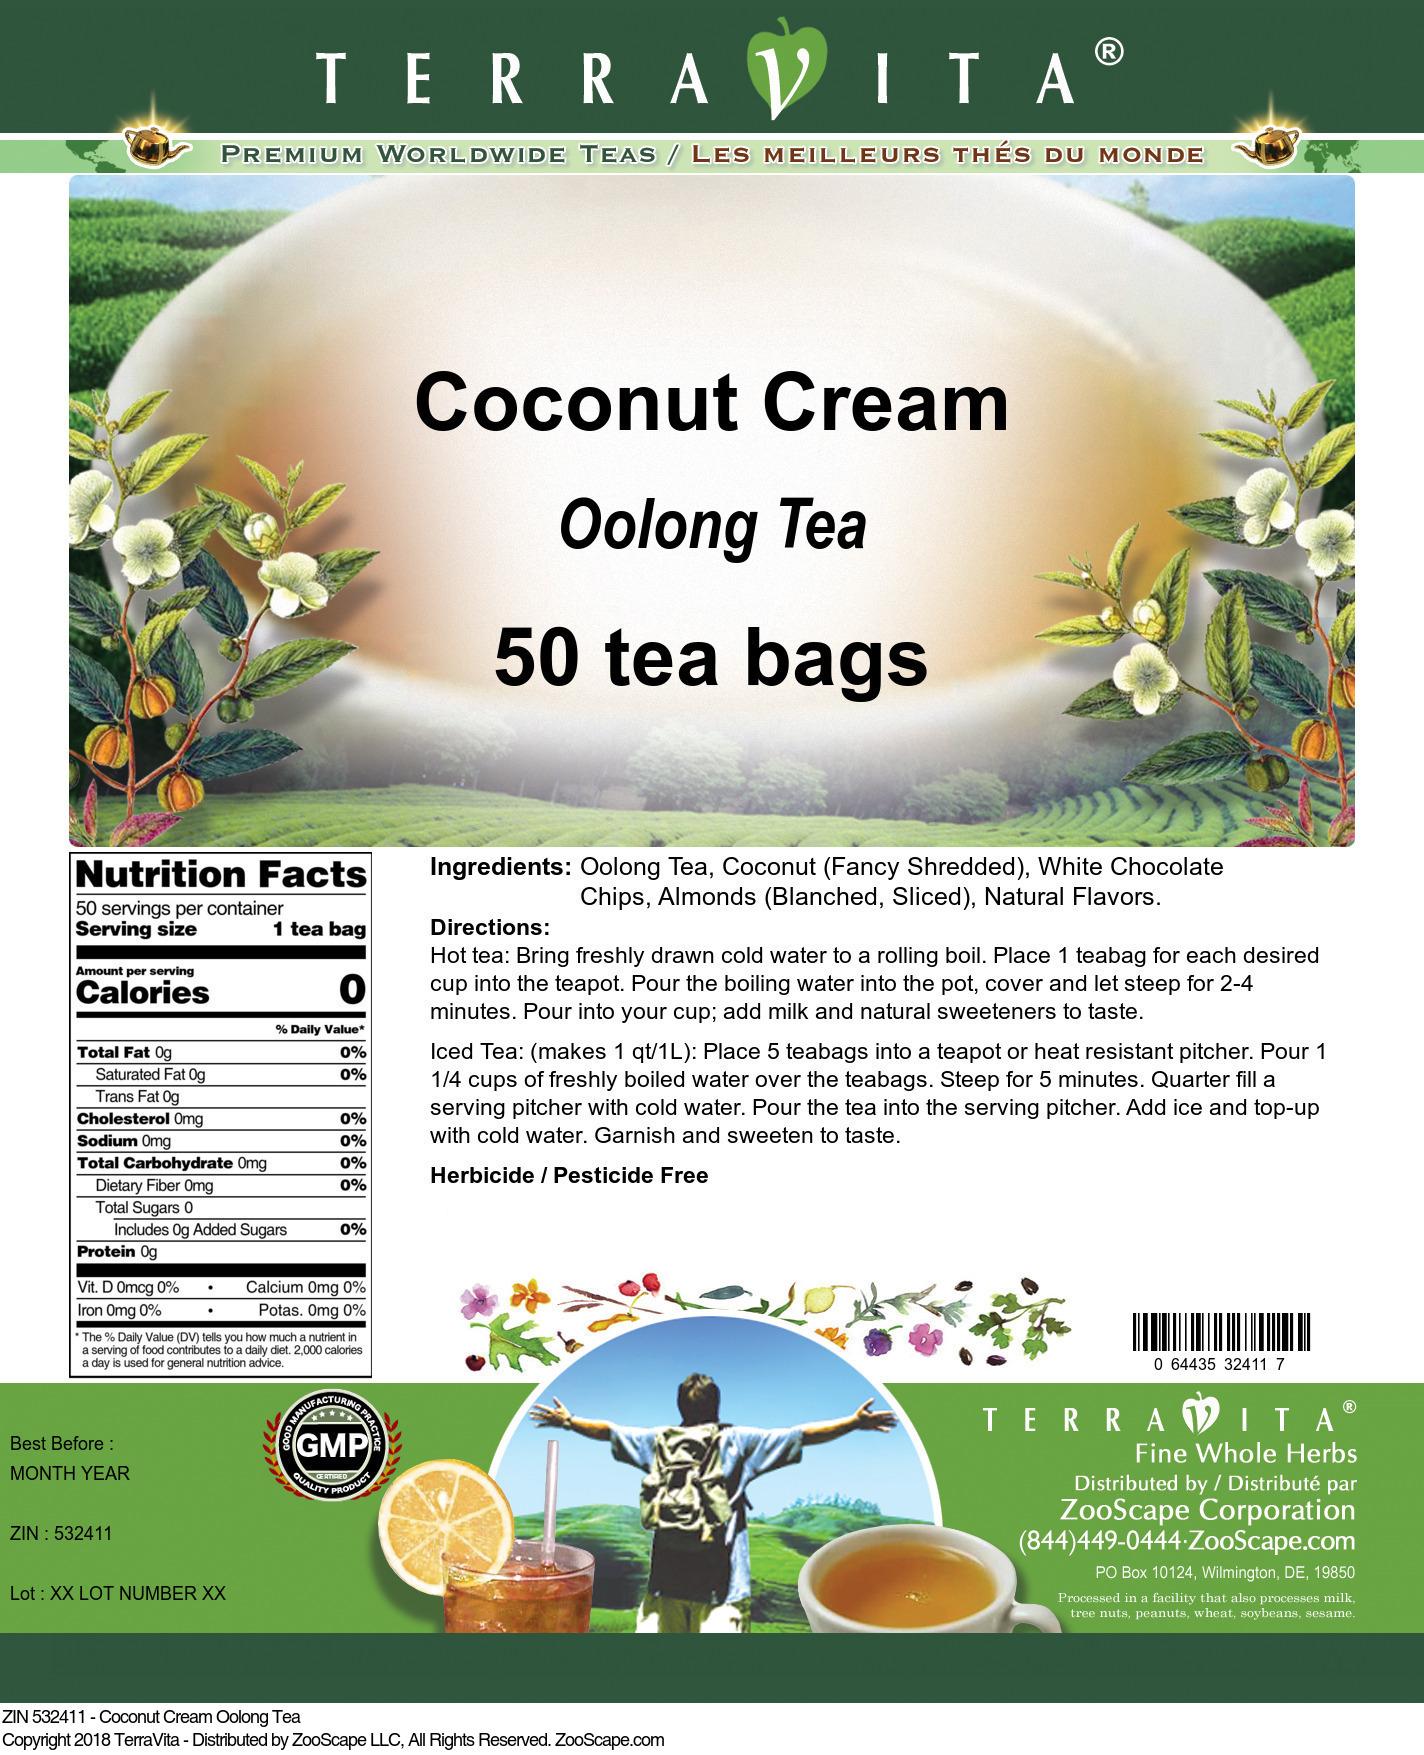 Coconut Cream Oolong Tea